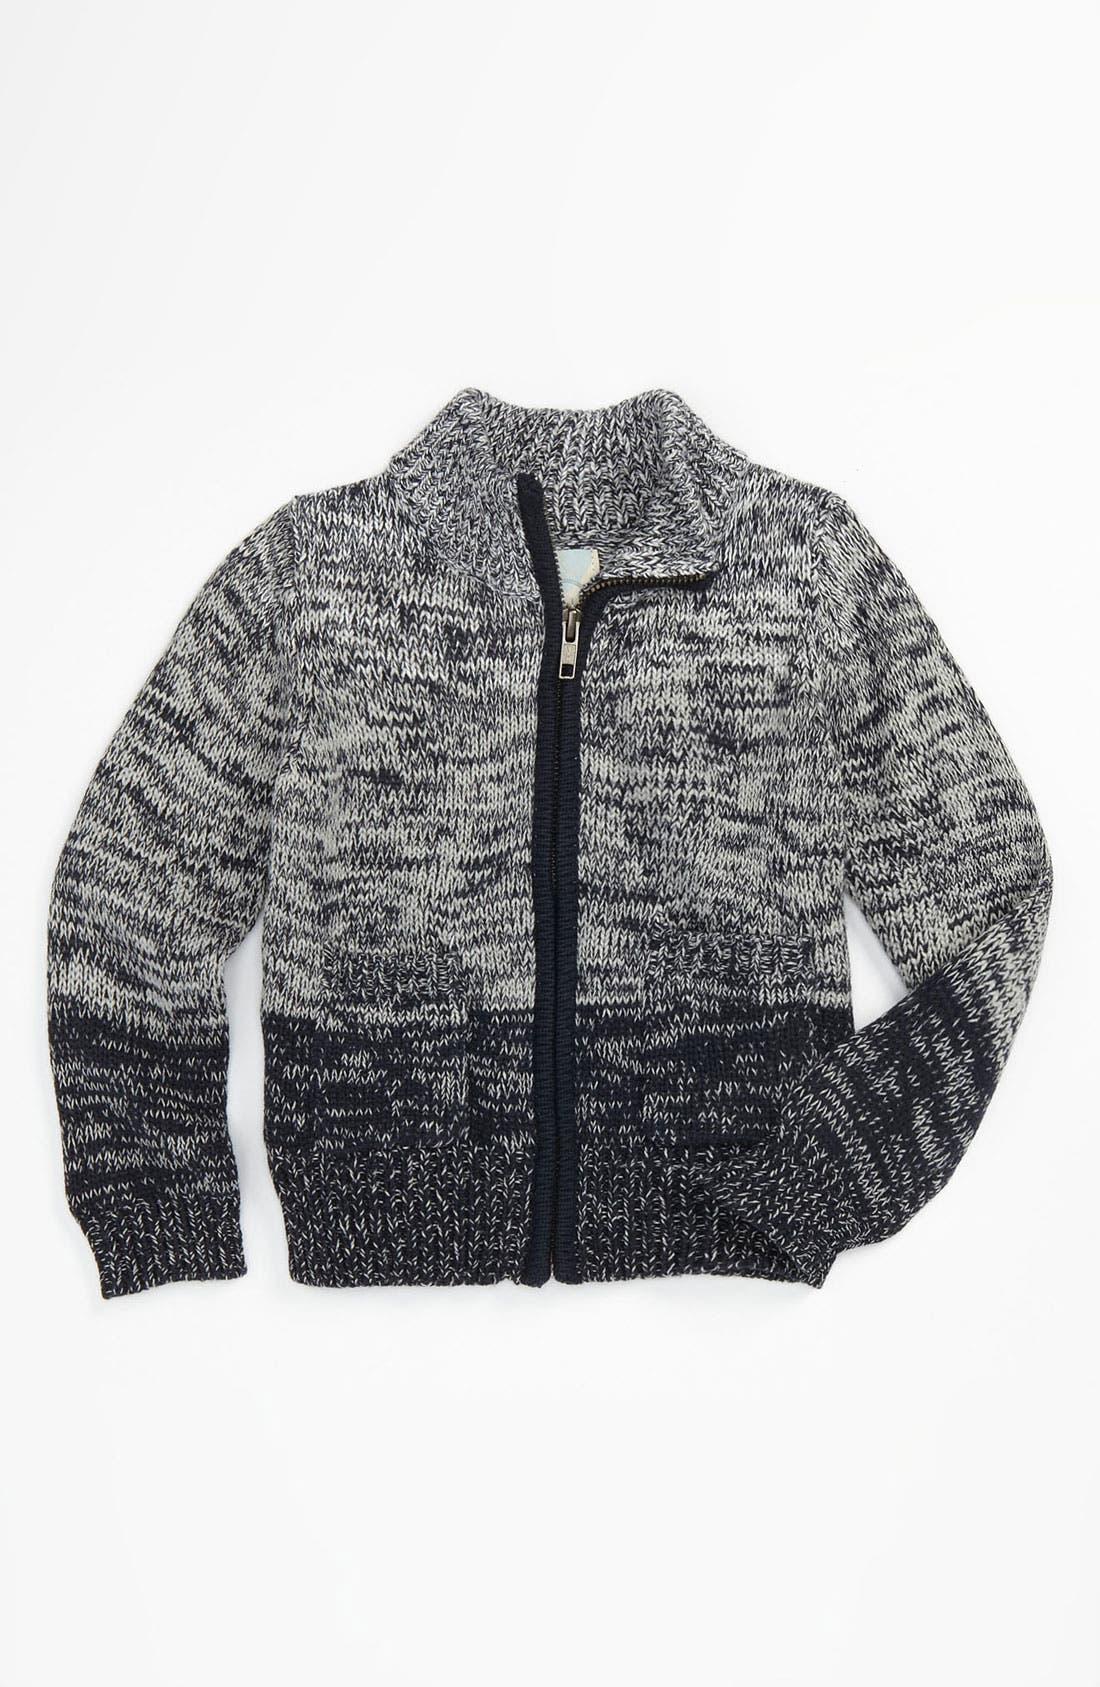 Alternate Image 1 Selected - Peek 'Gerard' Ombré Sweater (Infant)